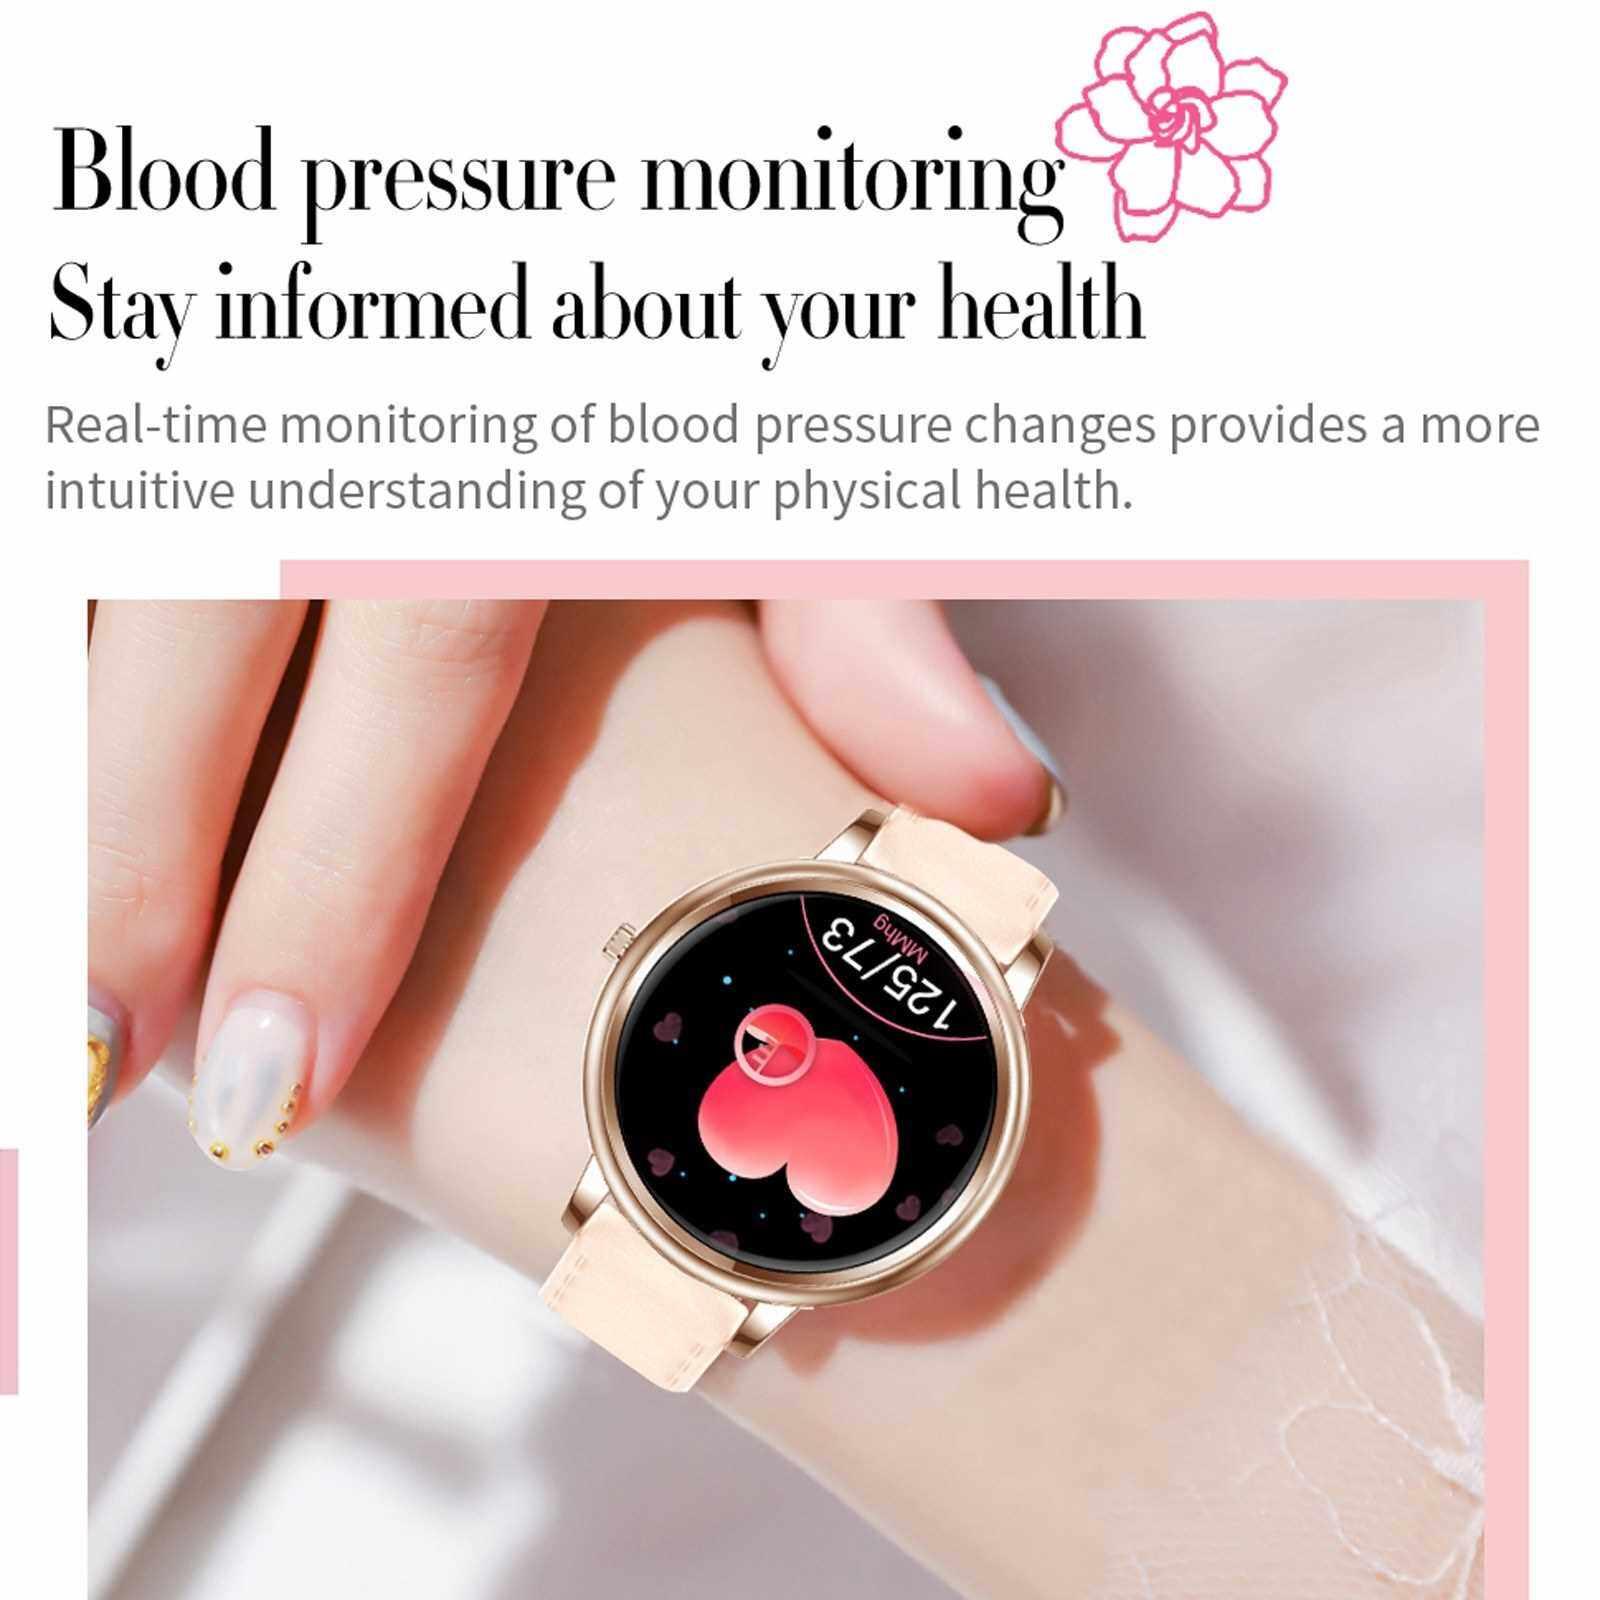 Women Smart Watch Fitness Tracker Bluetooth Bracelet Smart Sports Band Heart Rate Blood Pressure Sleeping Monitor Wristband Touch Screen IP67 Waterproof Information Reminder (Silver)